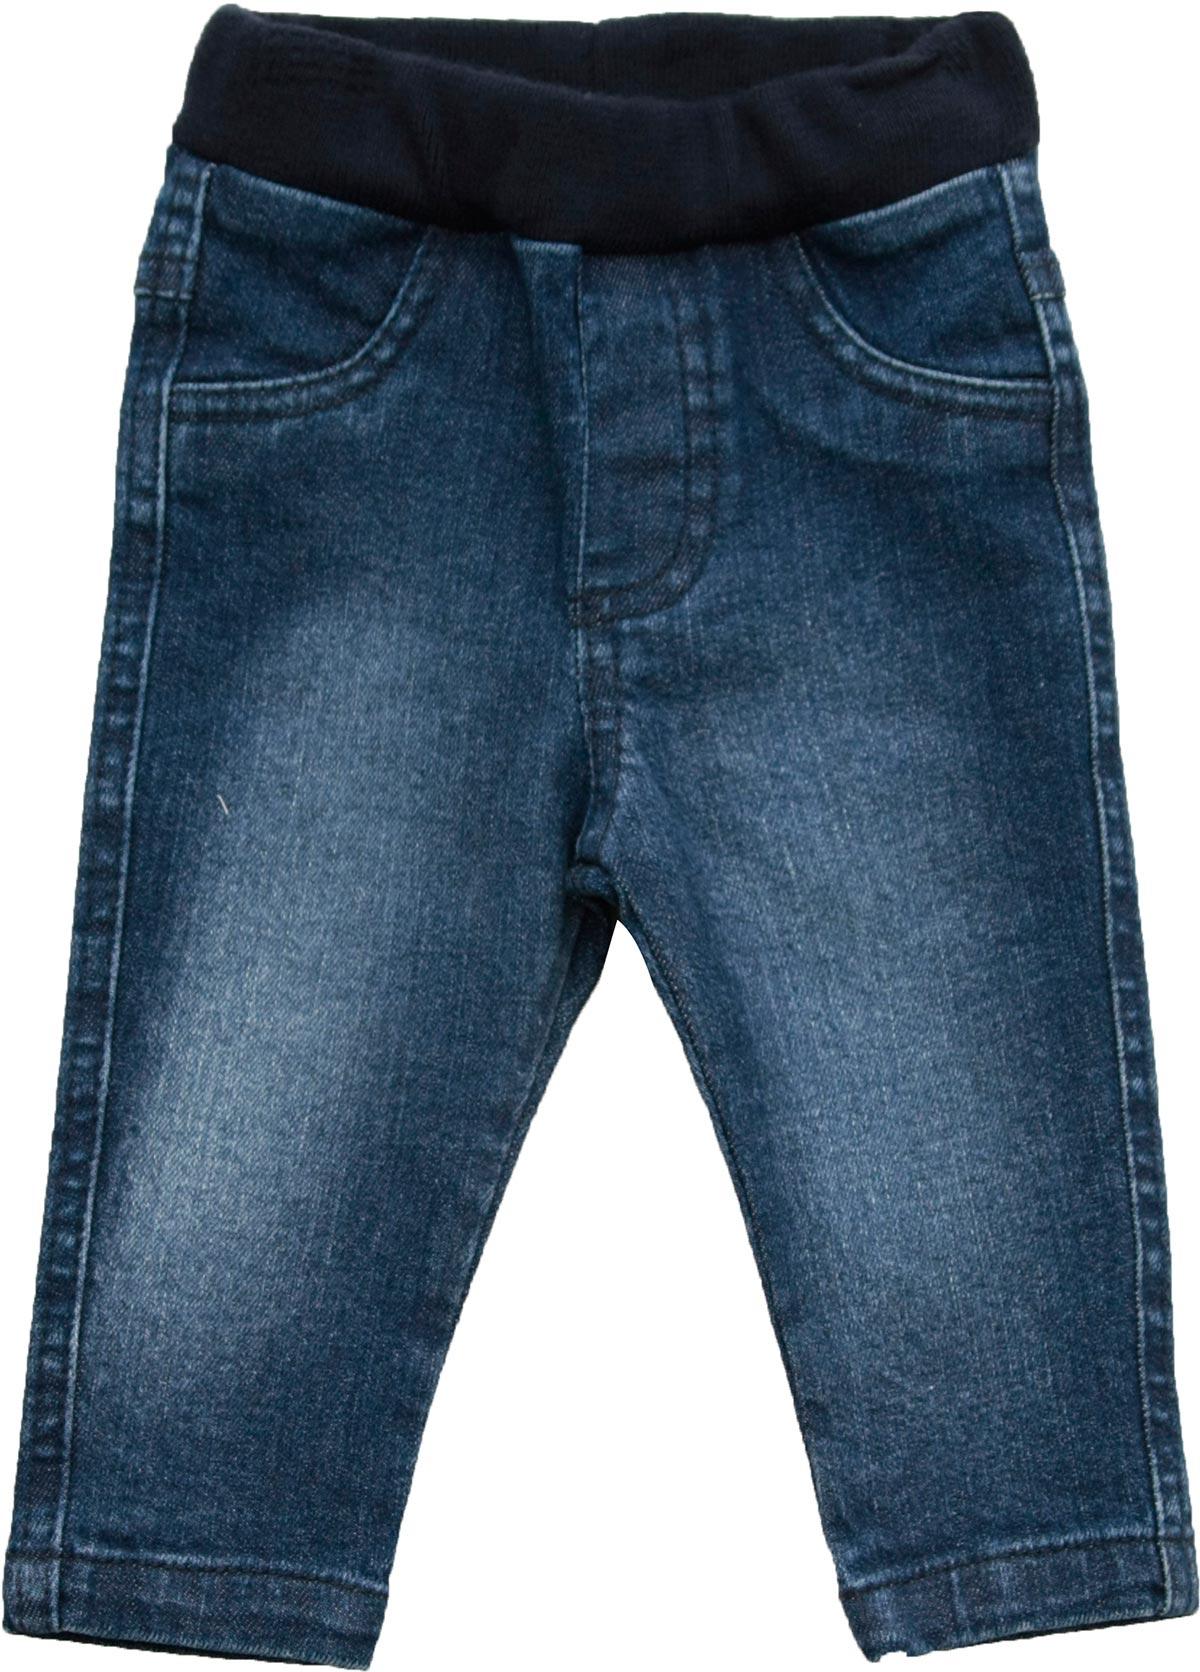 70.586 - Calça Avulsa Jeans